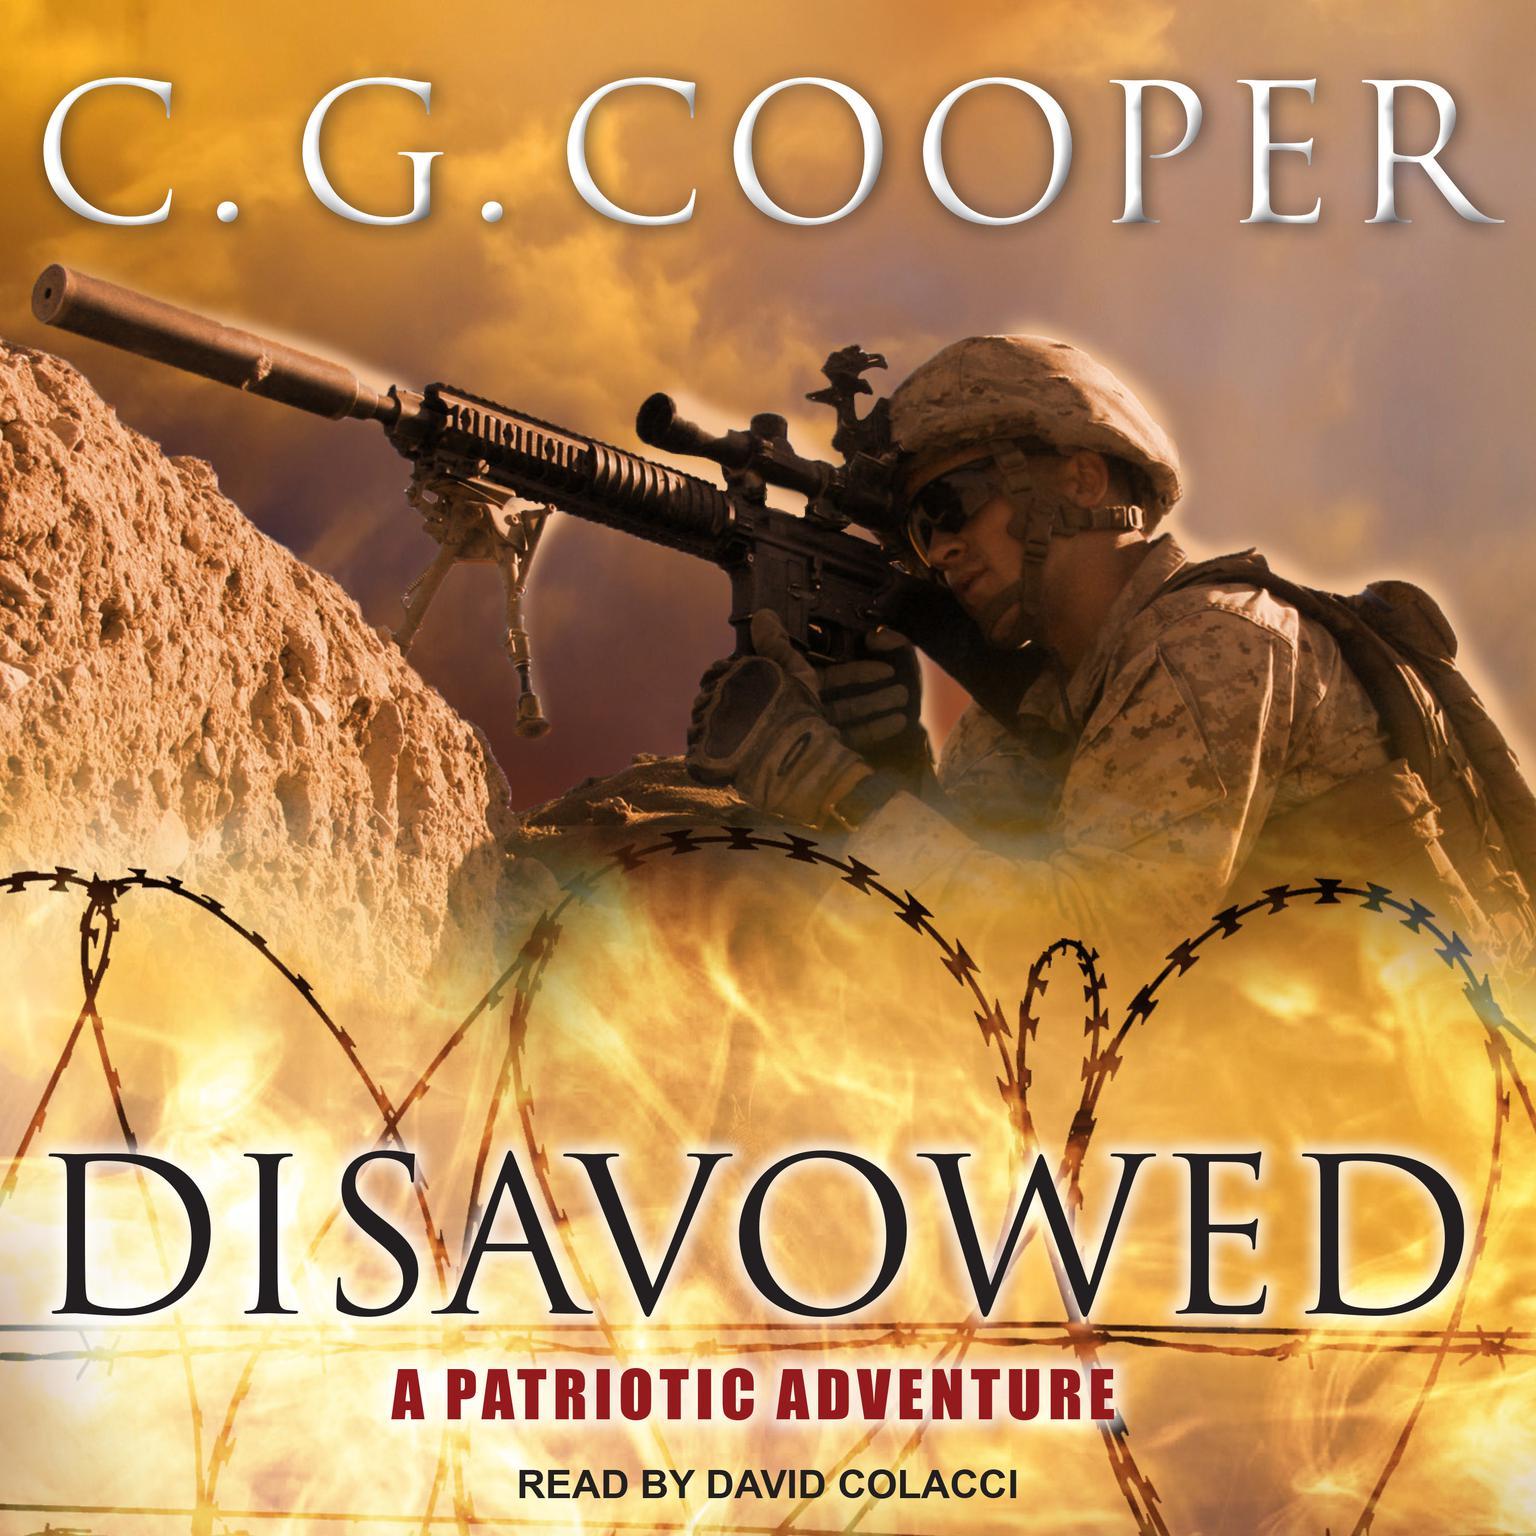 Disavowed: A Patriotic Adventure Audiobook, by C. G. Cooper